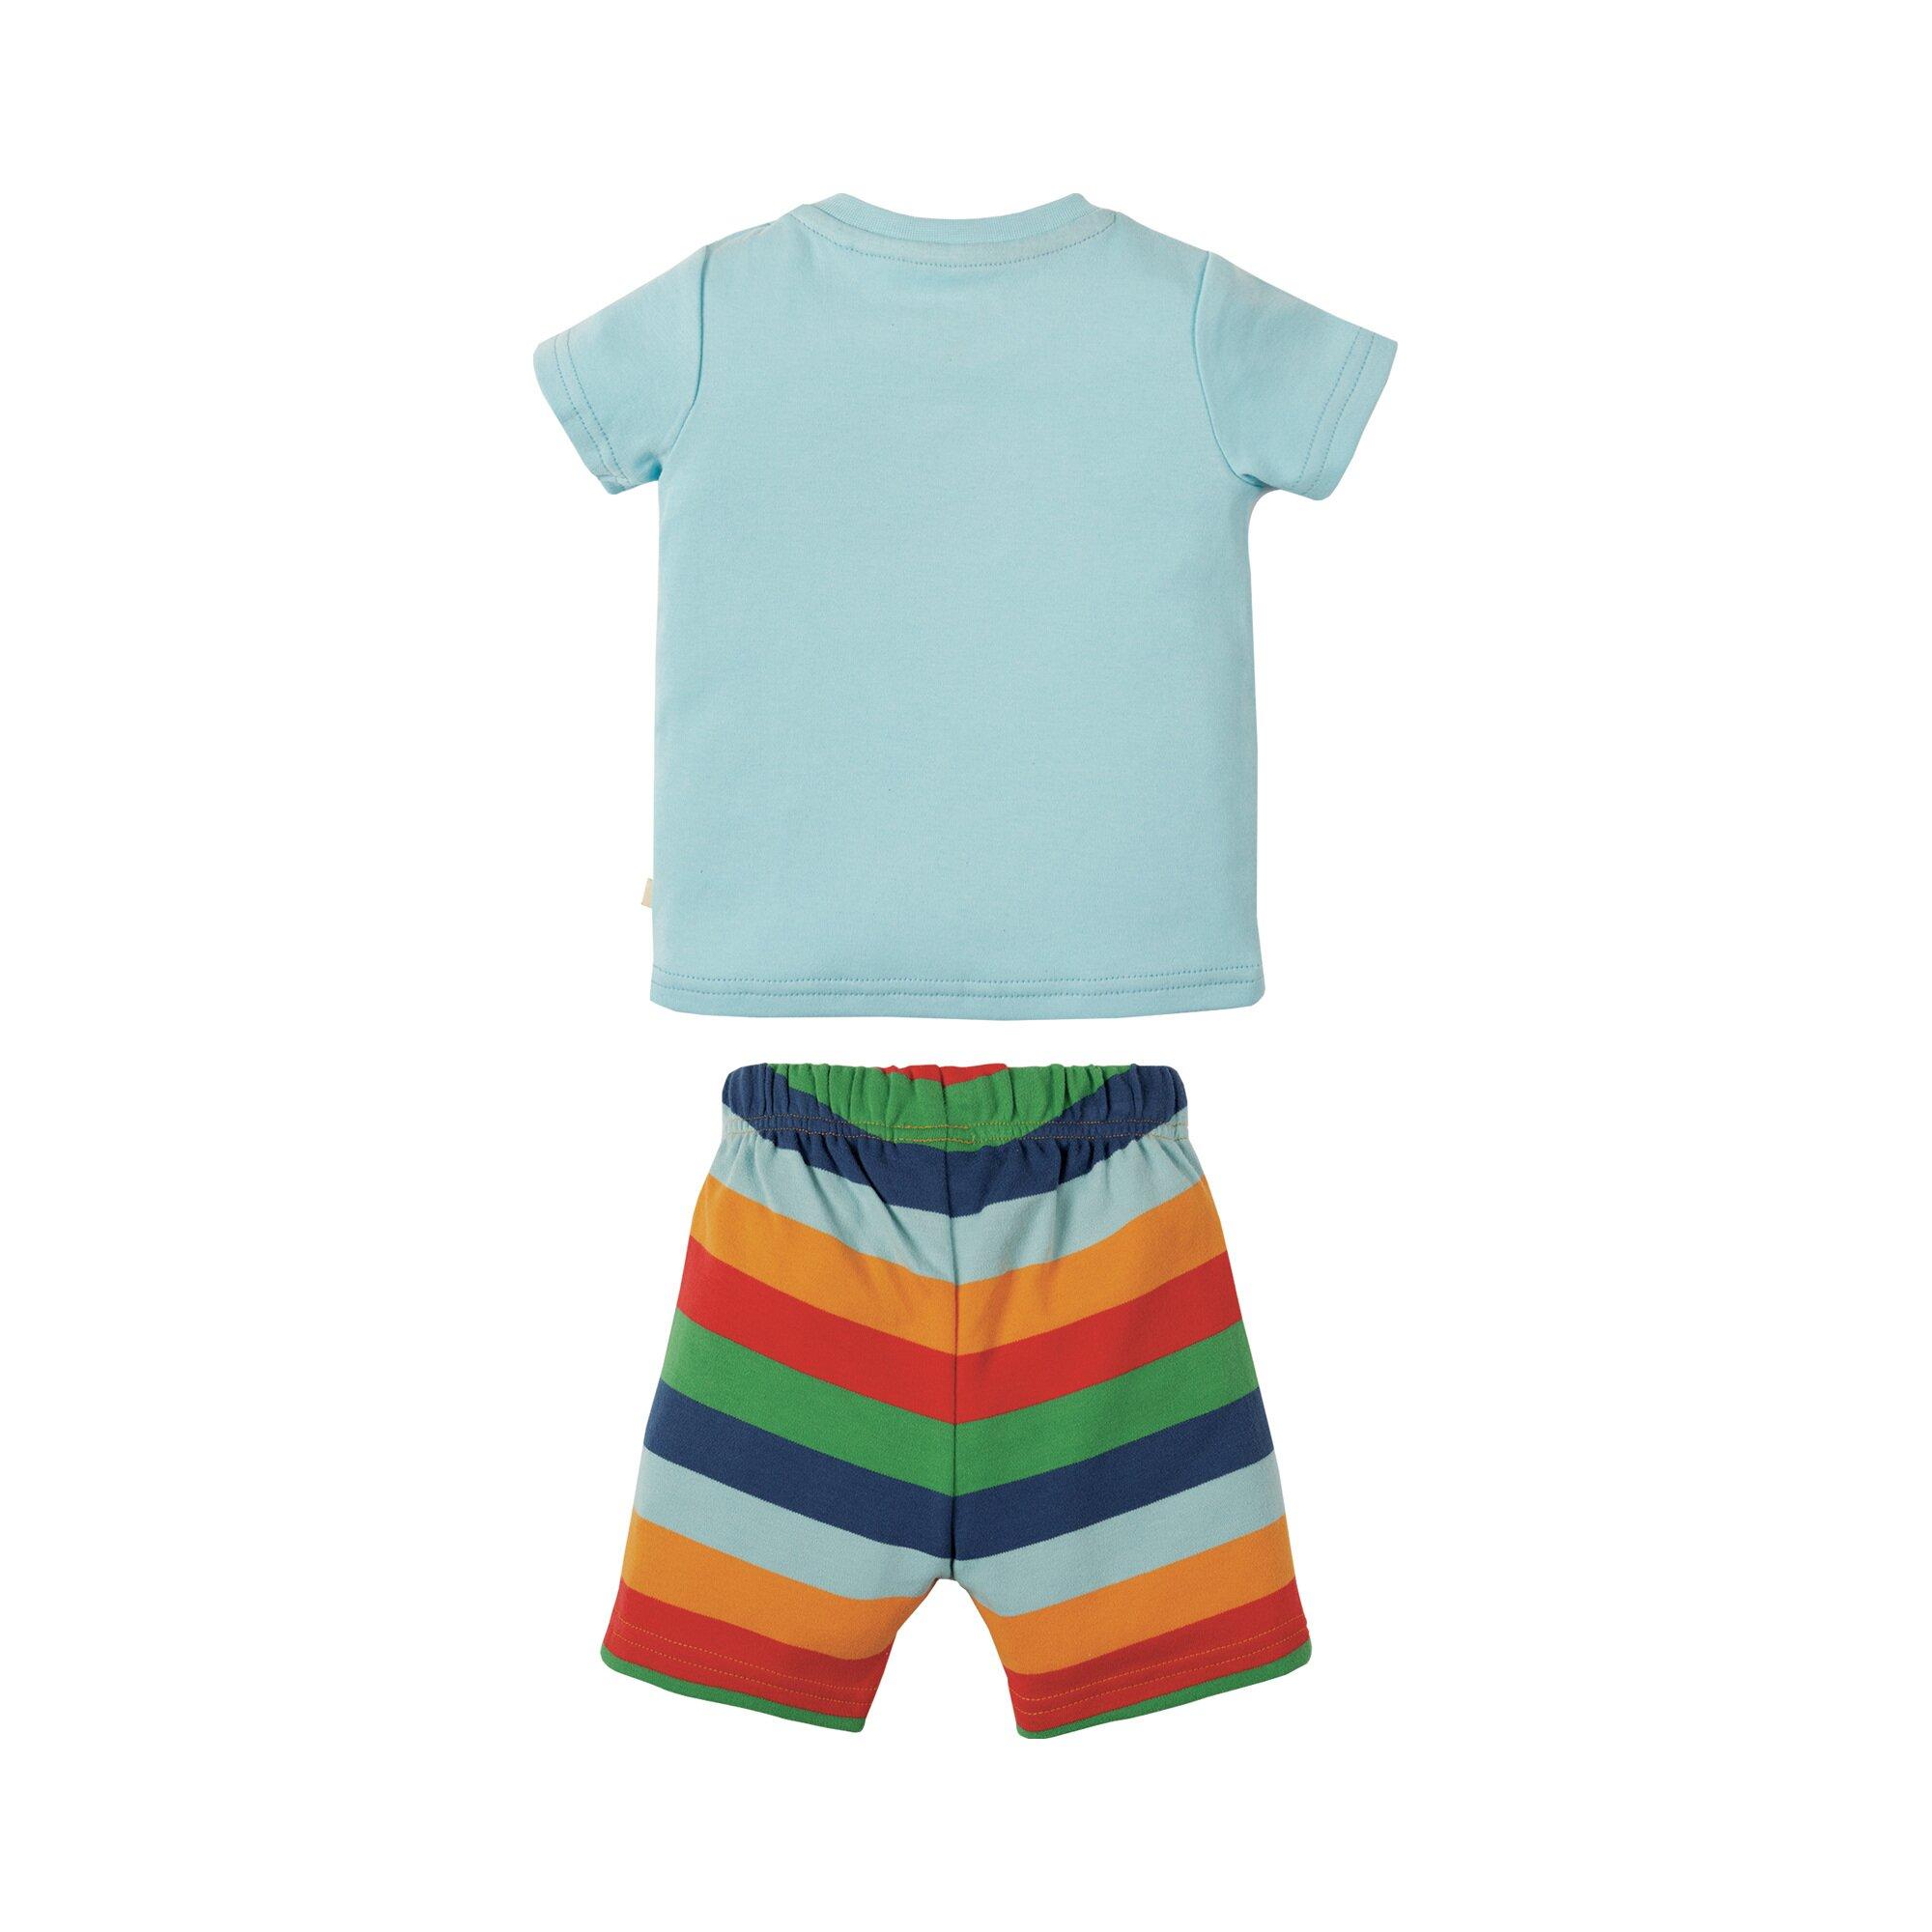 frugi-2-tlg-set-t-shirt-und-shorts-hei-luftballon